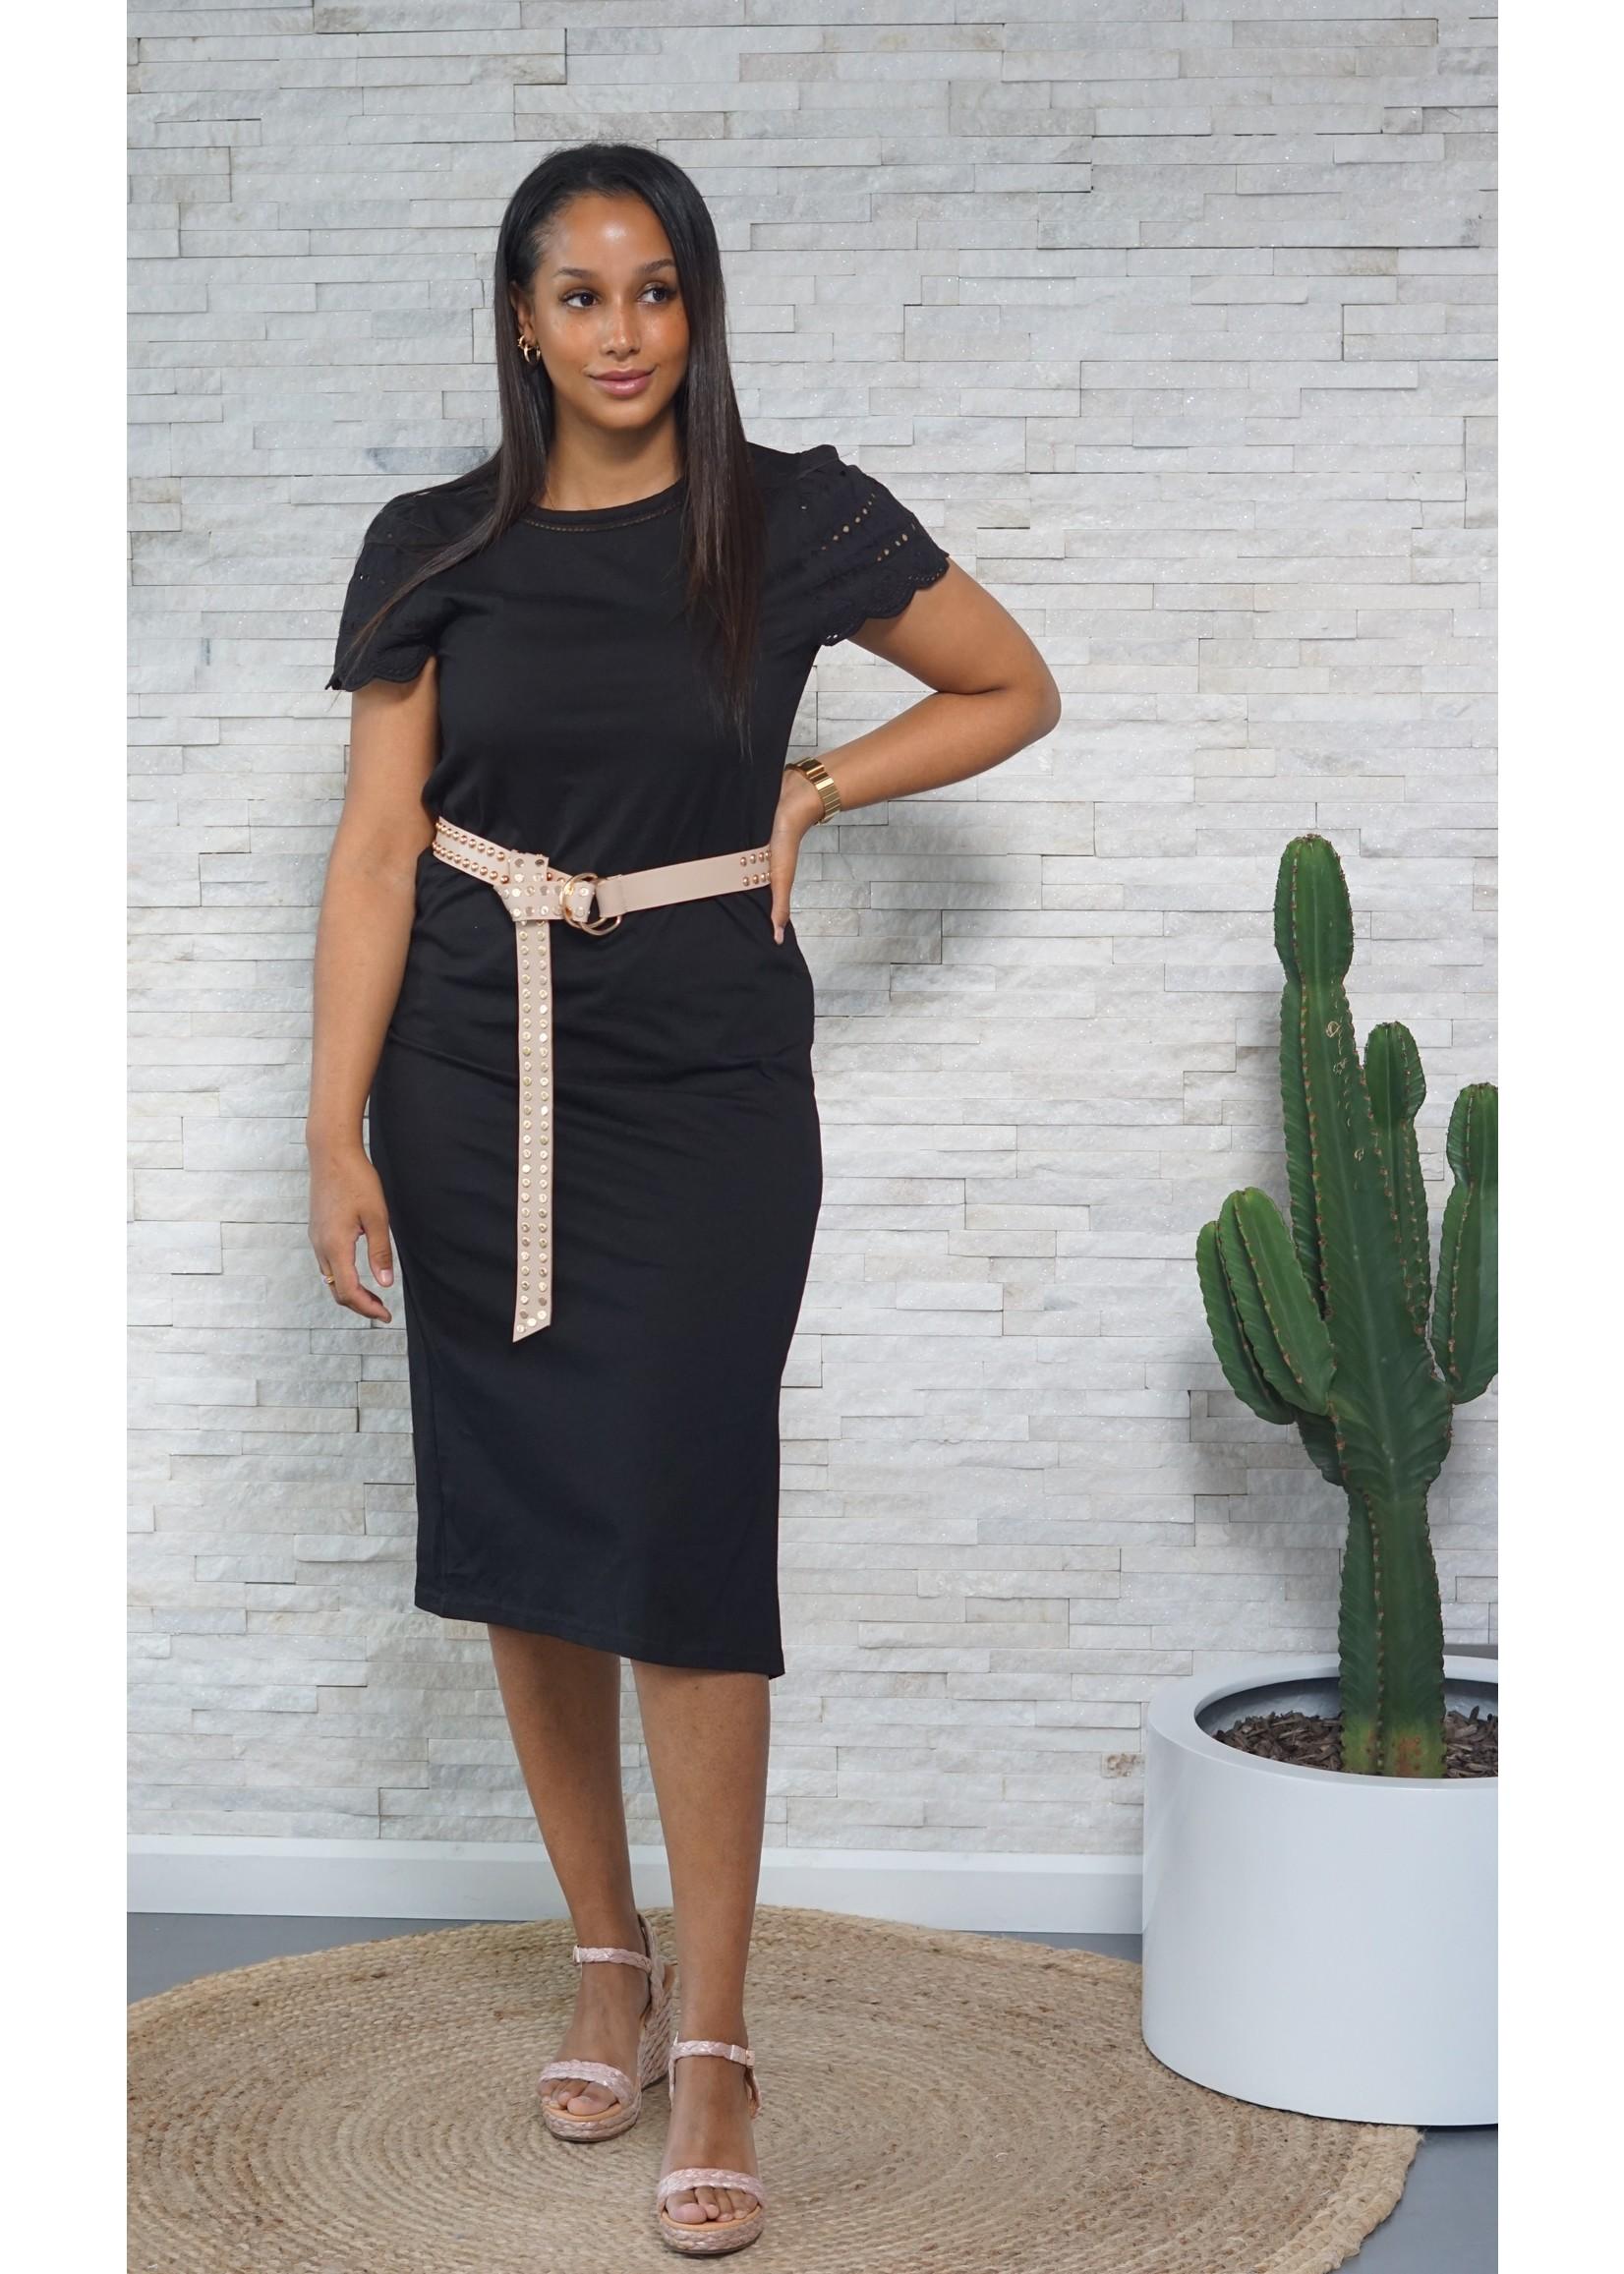 Favo black dress